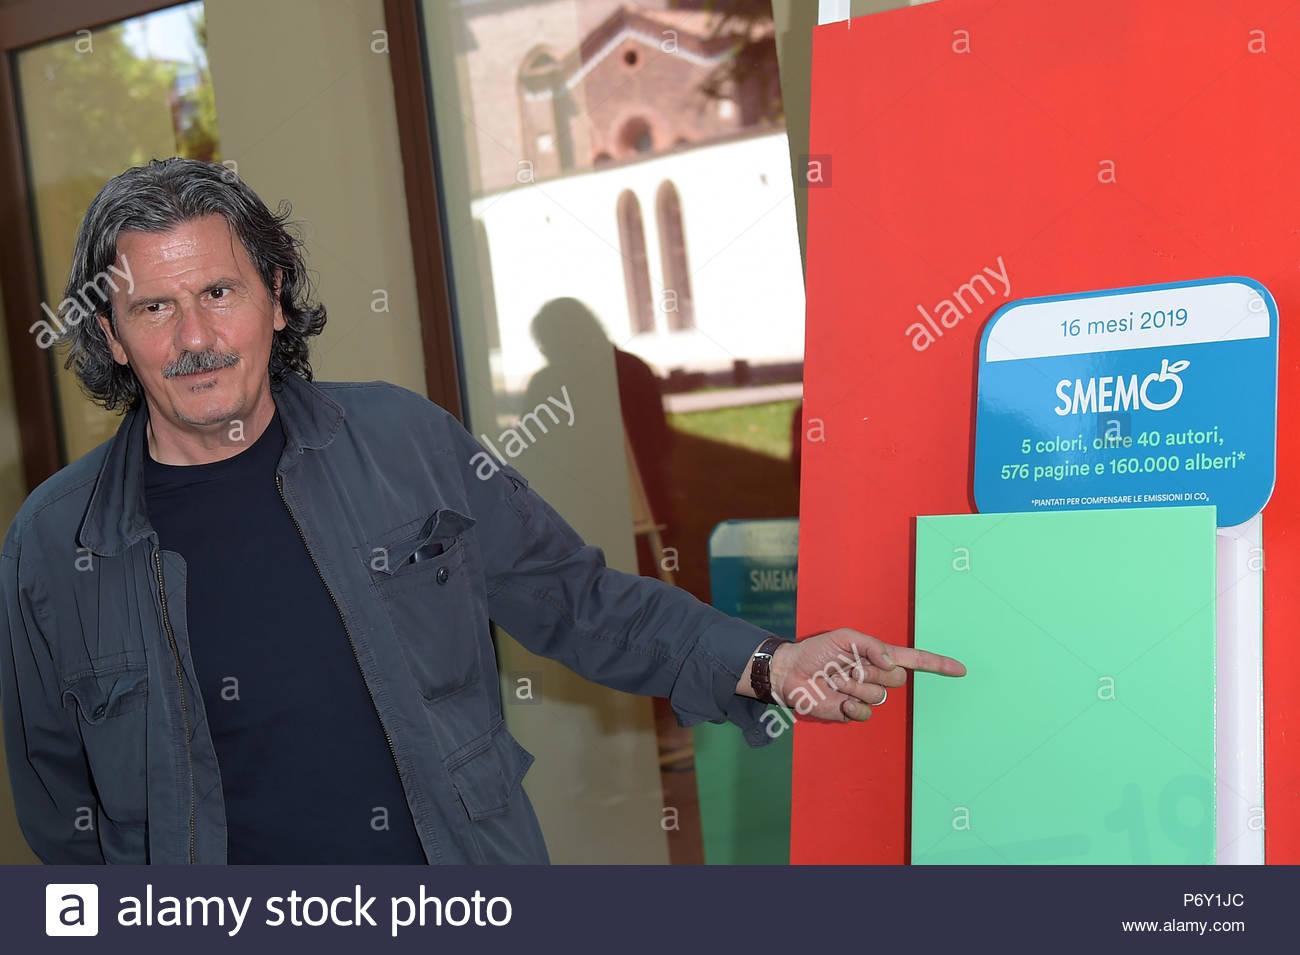 Nico Colonna milano 12-06-2018 - Stock Image